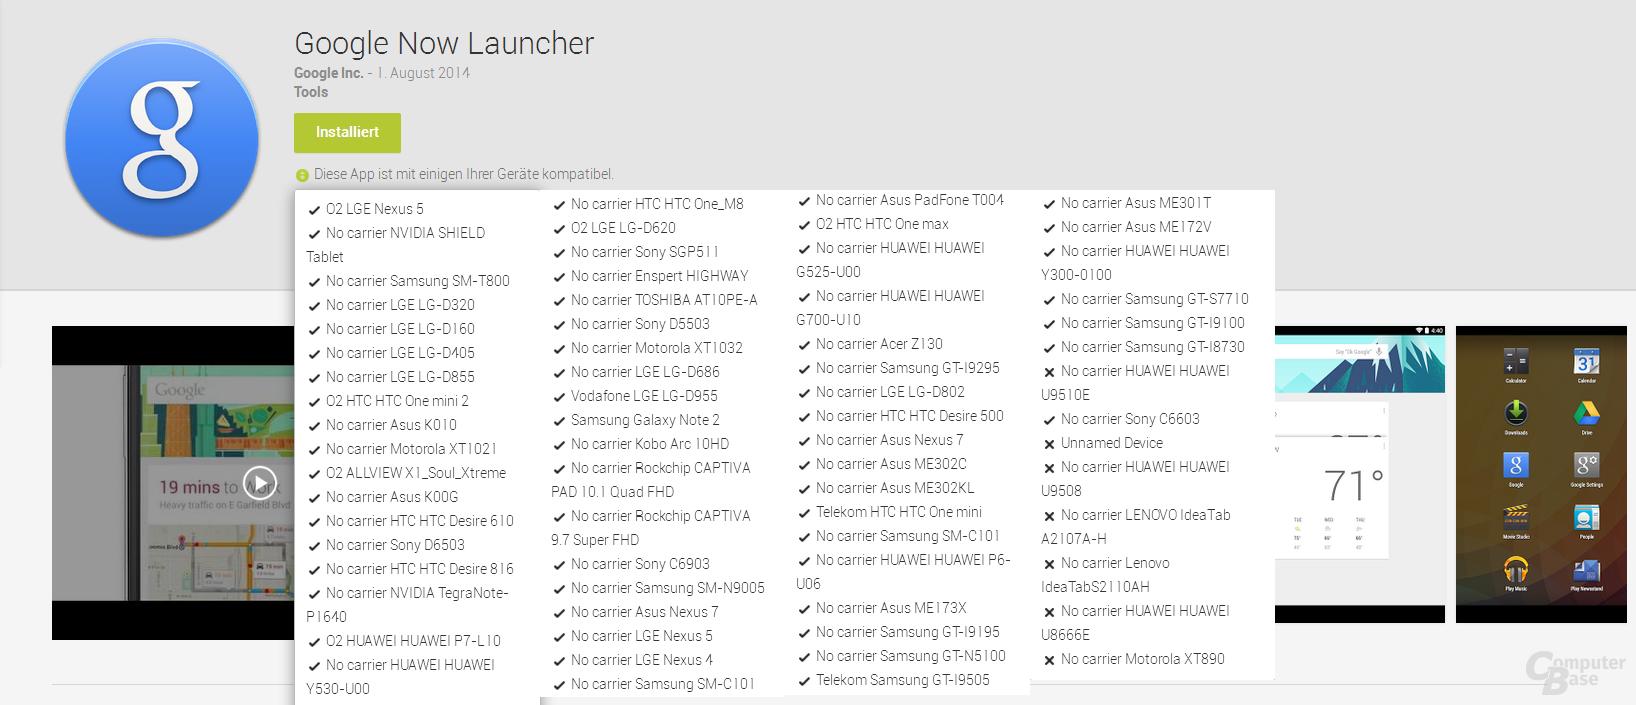 Google Now Launcher - Kompatibilität